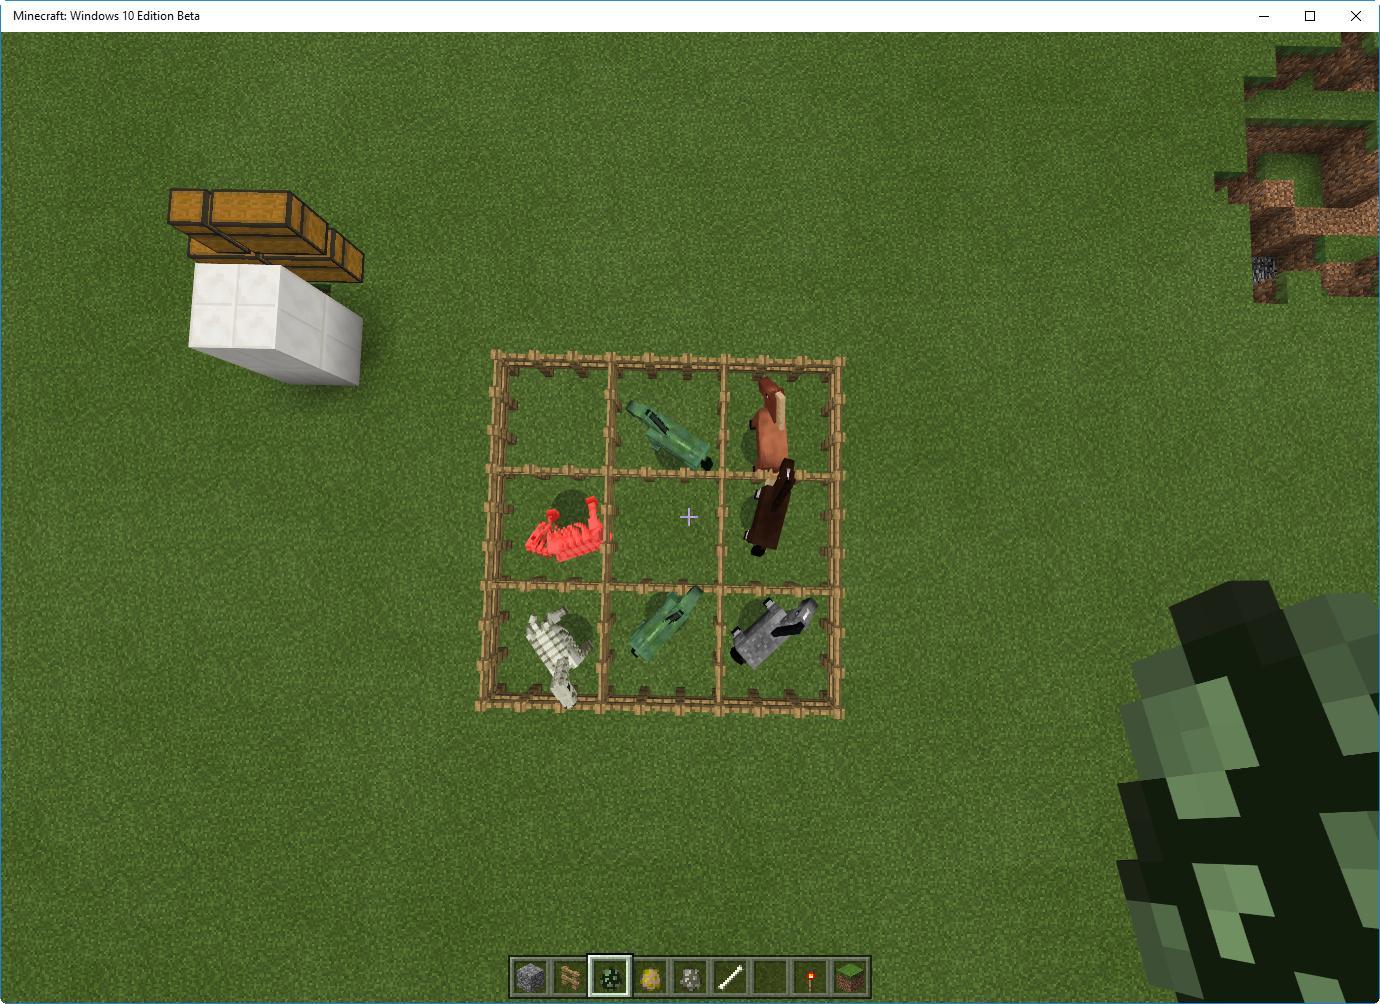 minecraft how to summon skeleton horse with saddle